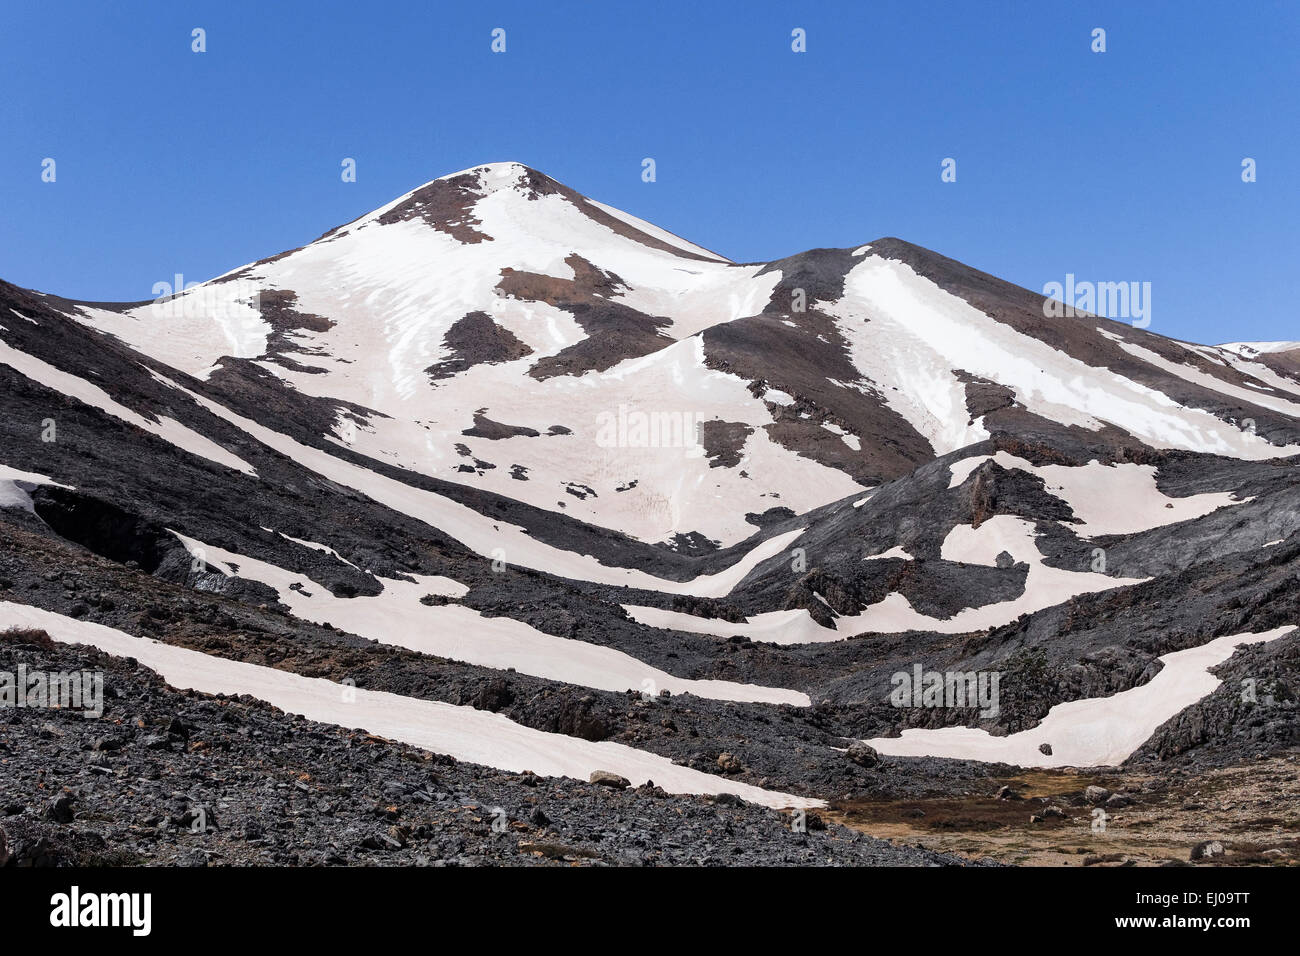 Aerosol, particle, mountains, peak, mountain world, mountain wilderness, rocky, cliff scenery, spring, mountains, - Stock Image